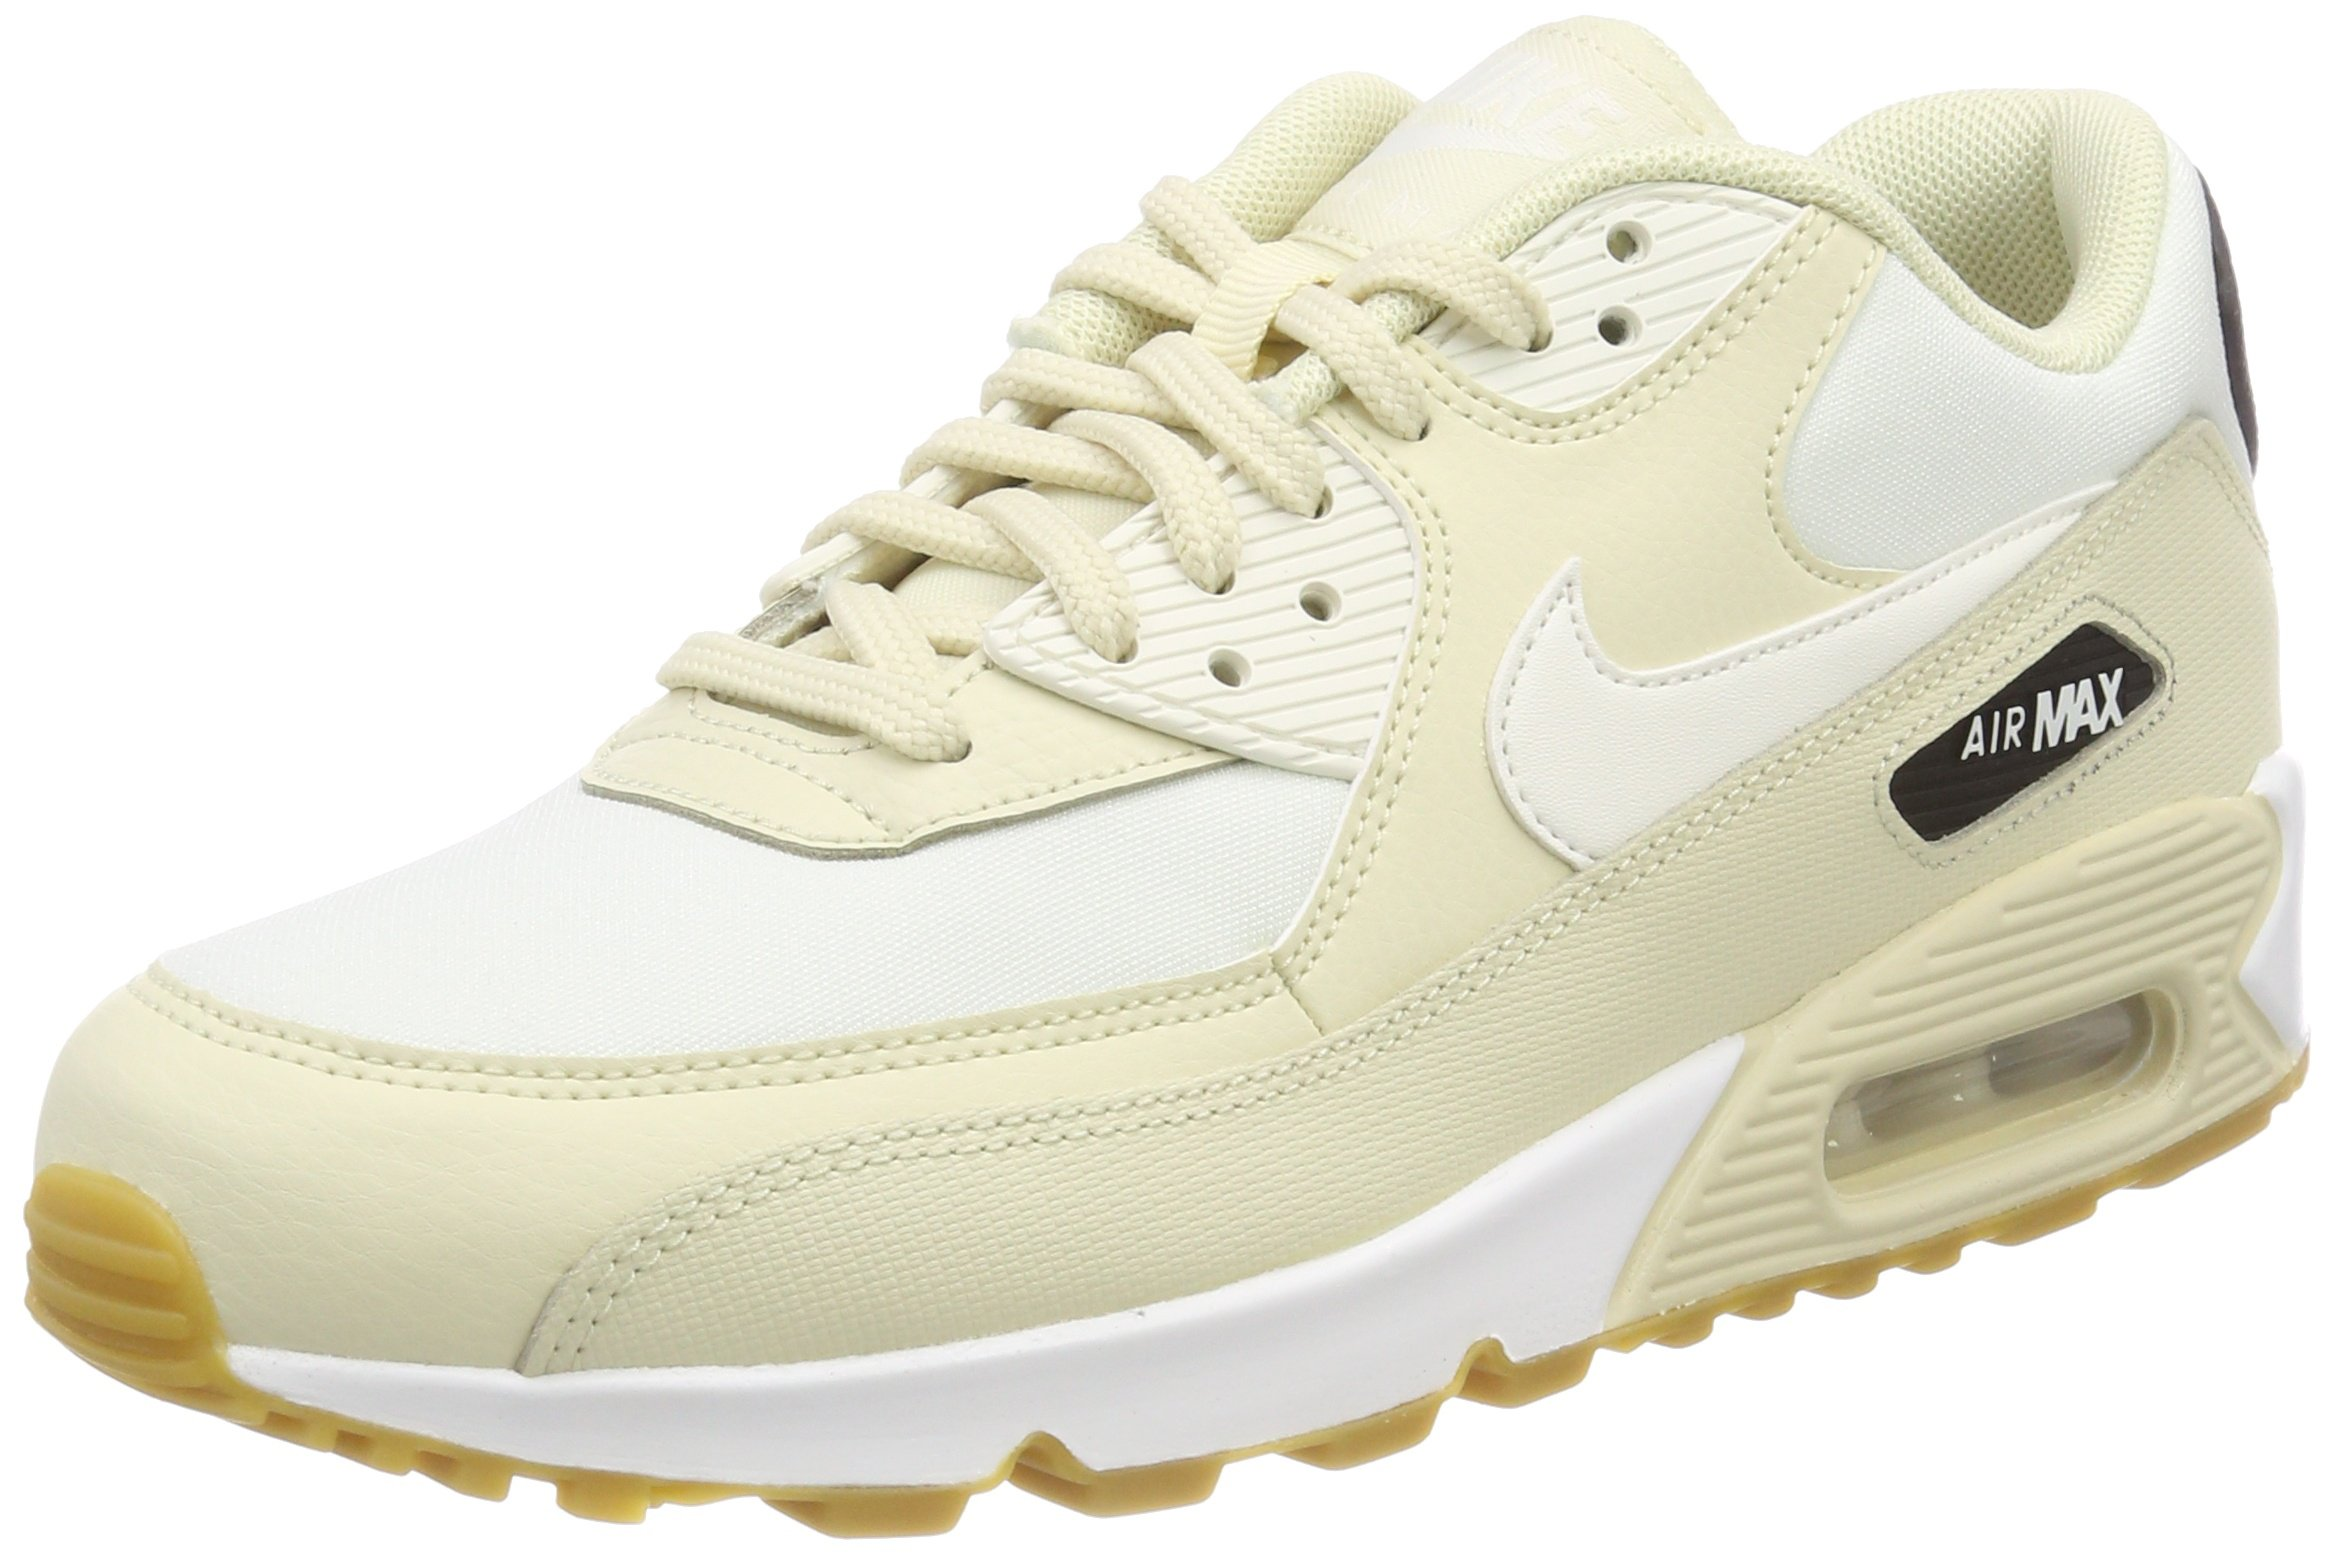 check out a62e8 38c2d Galleon - Nike Women s WMNS Air Max 90 325213-207 Trainers, Beige  (Fossil Sail-Black-Gum Light Brown 325213-207), 3 UK 36 EU